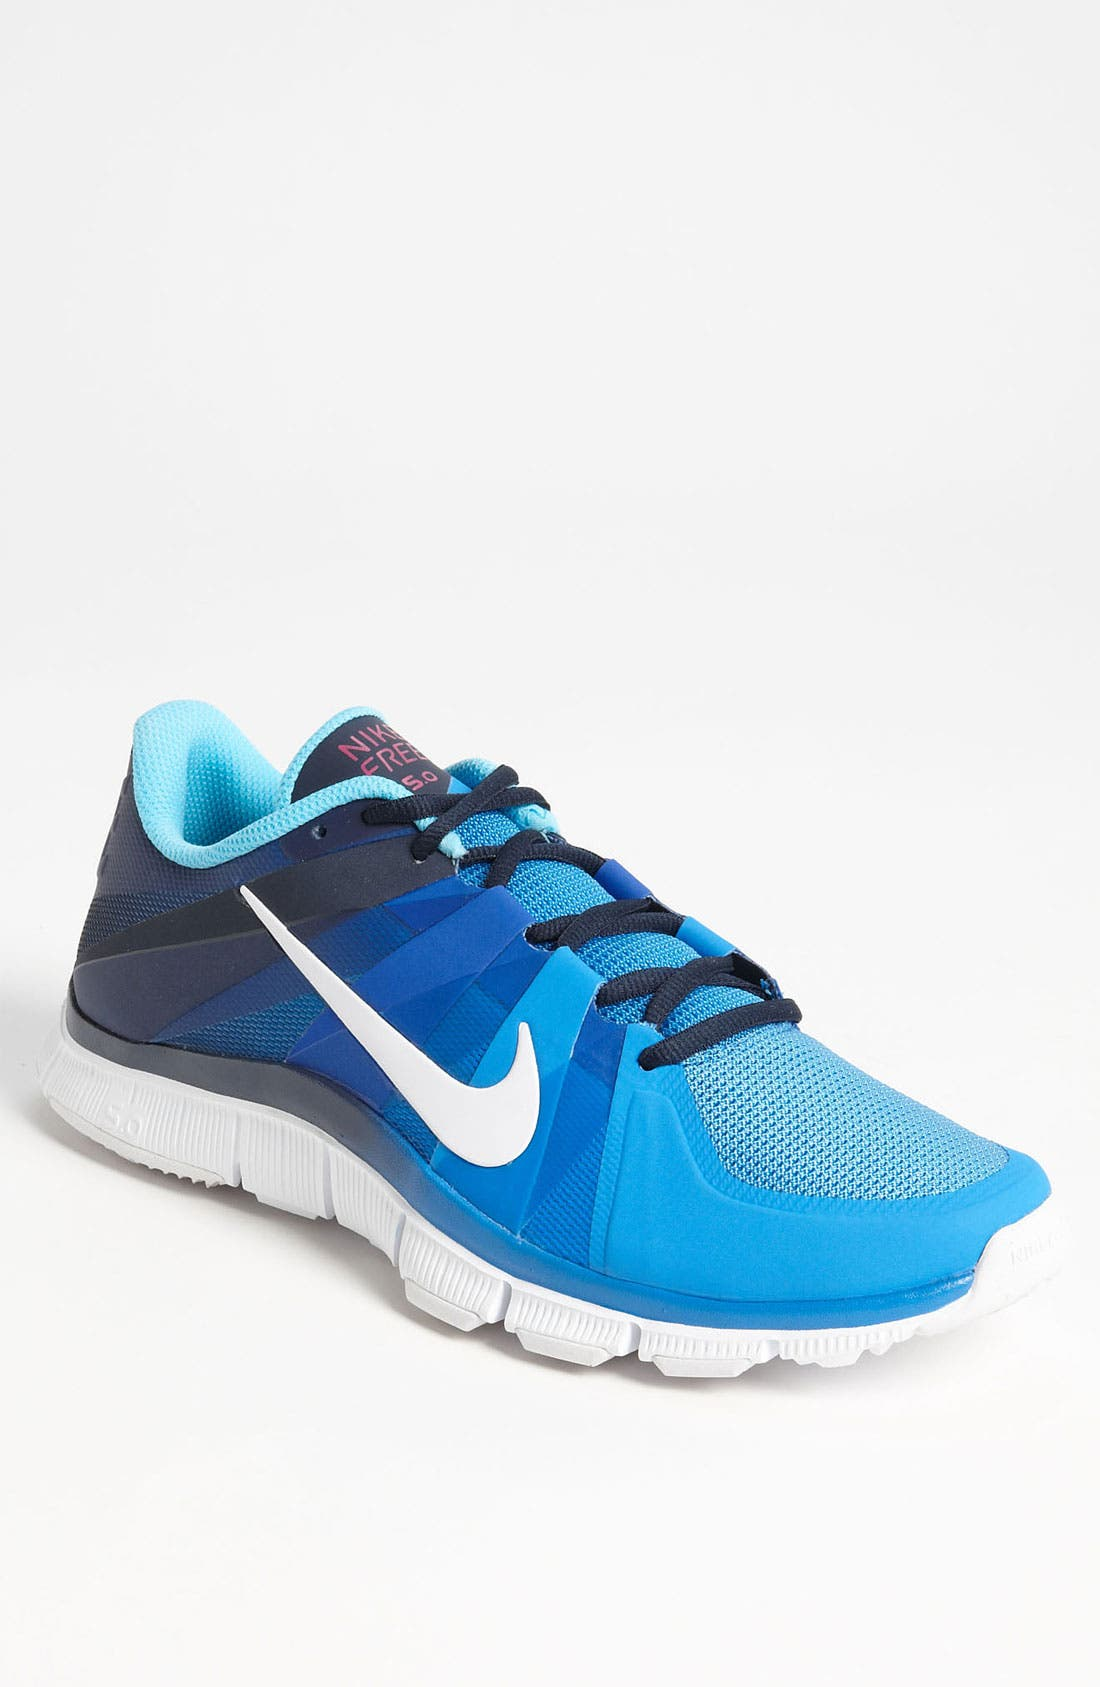 Alternate Image 1 Selected - Nike 'Free Trainer' Training Shoe (Men)